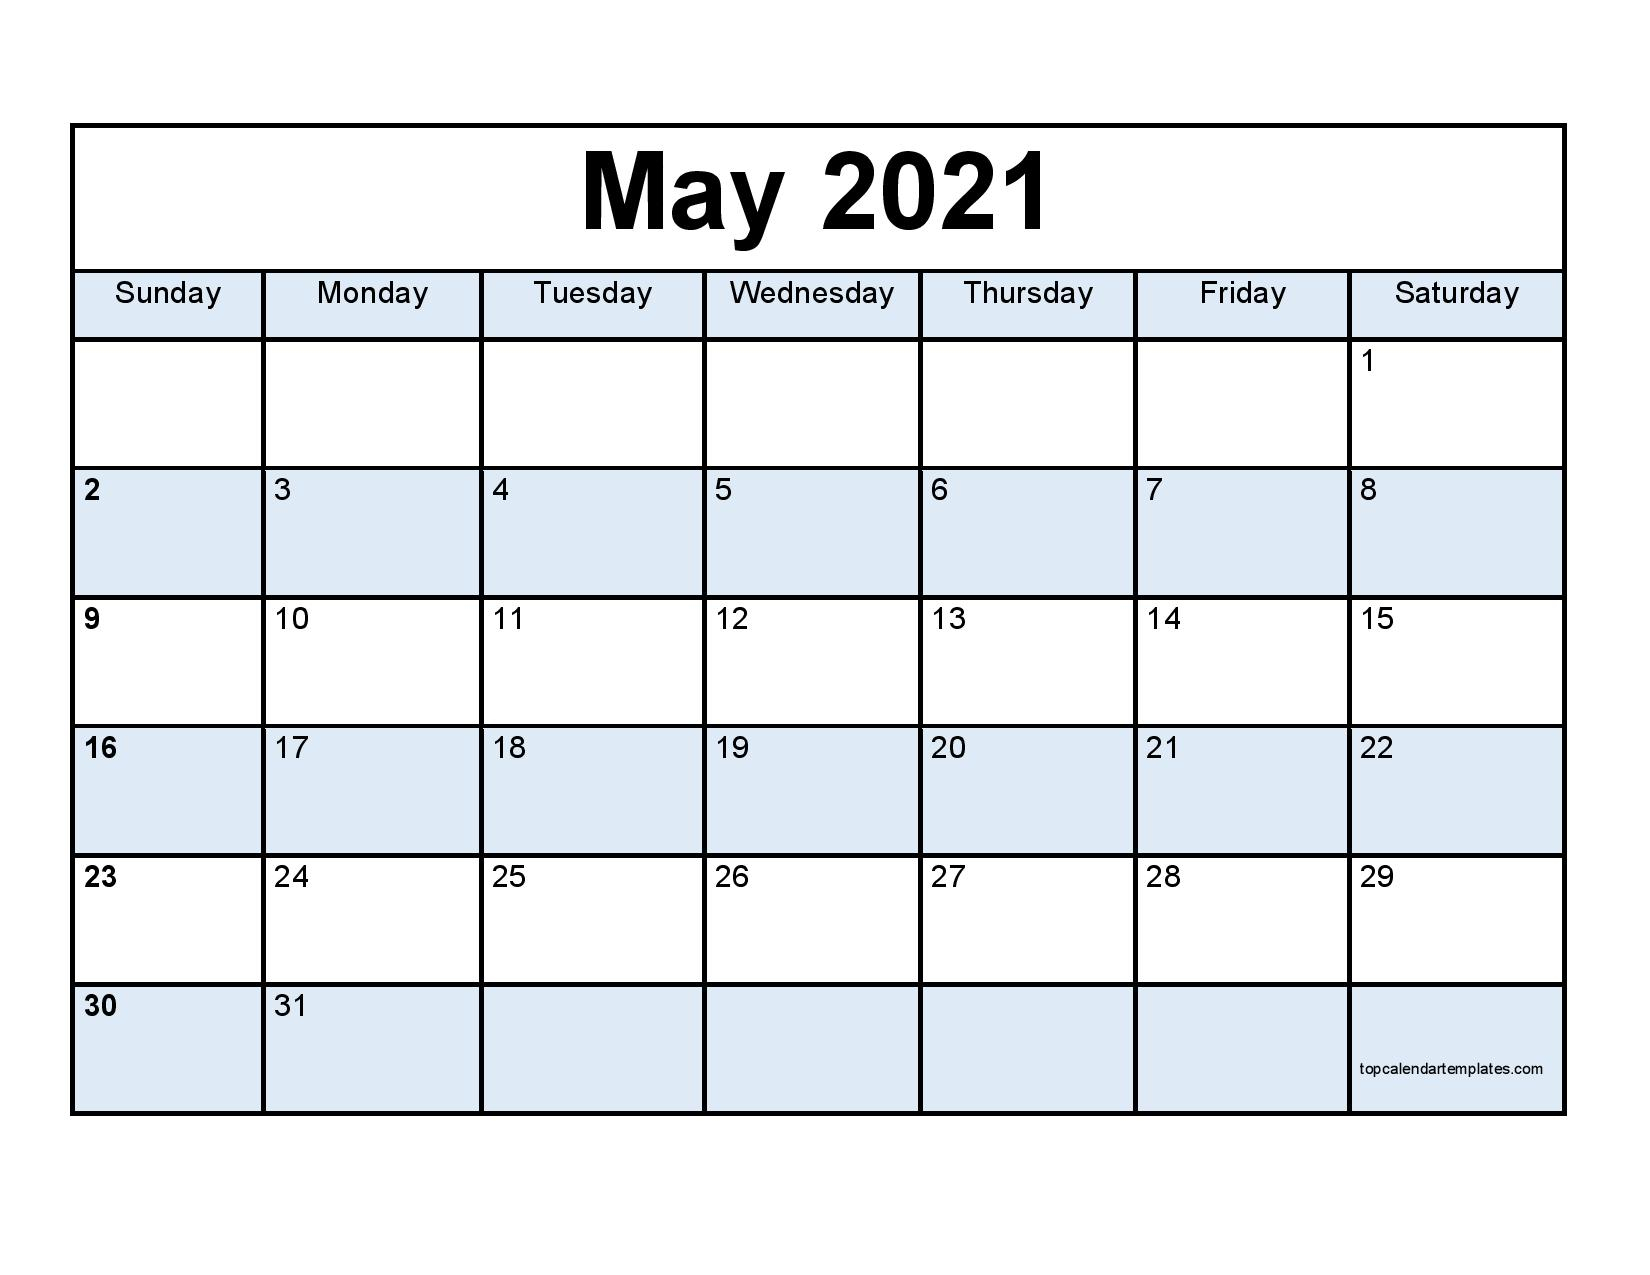 Free May 2021 Calendar Printable - Blank Templates